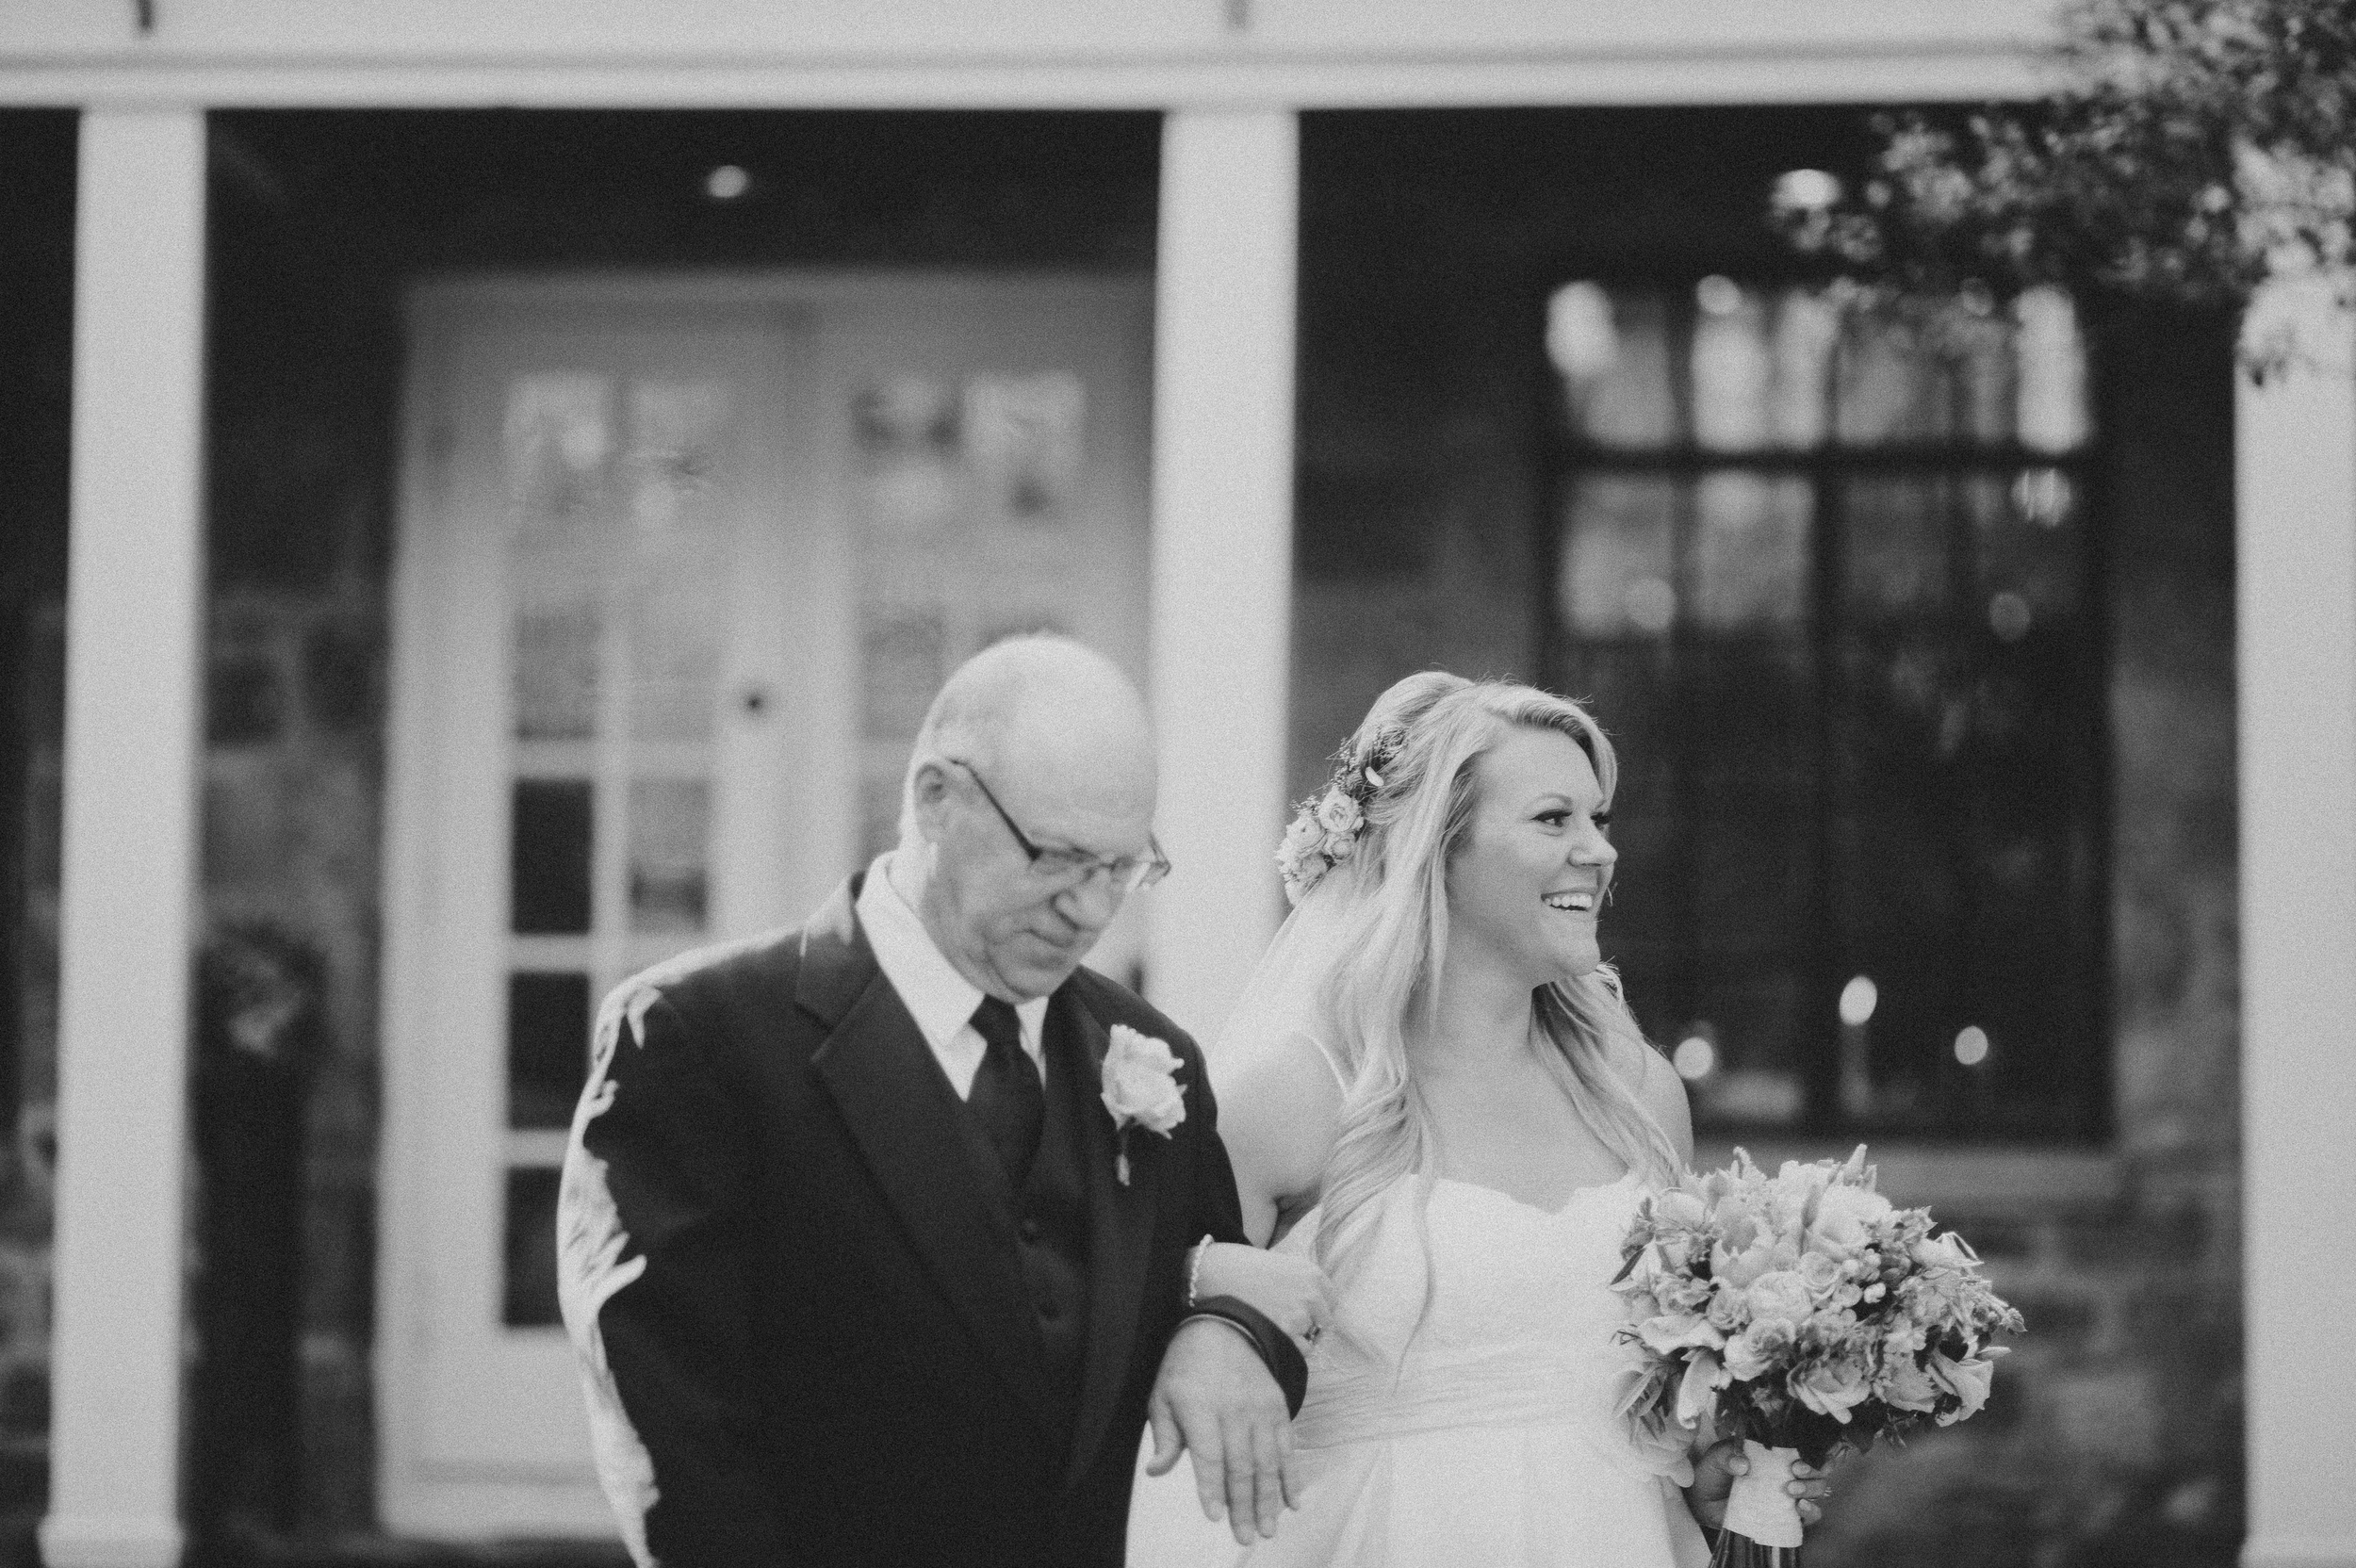 holly-hedge-estate-wedding-photographer-pat-robinson-photography-53.jpg